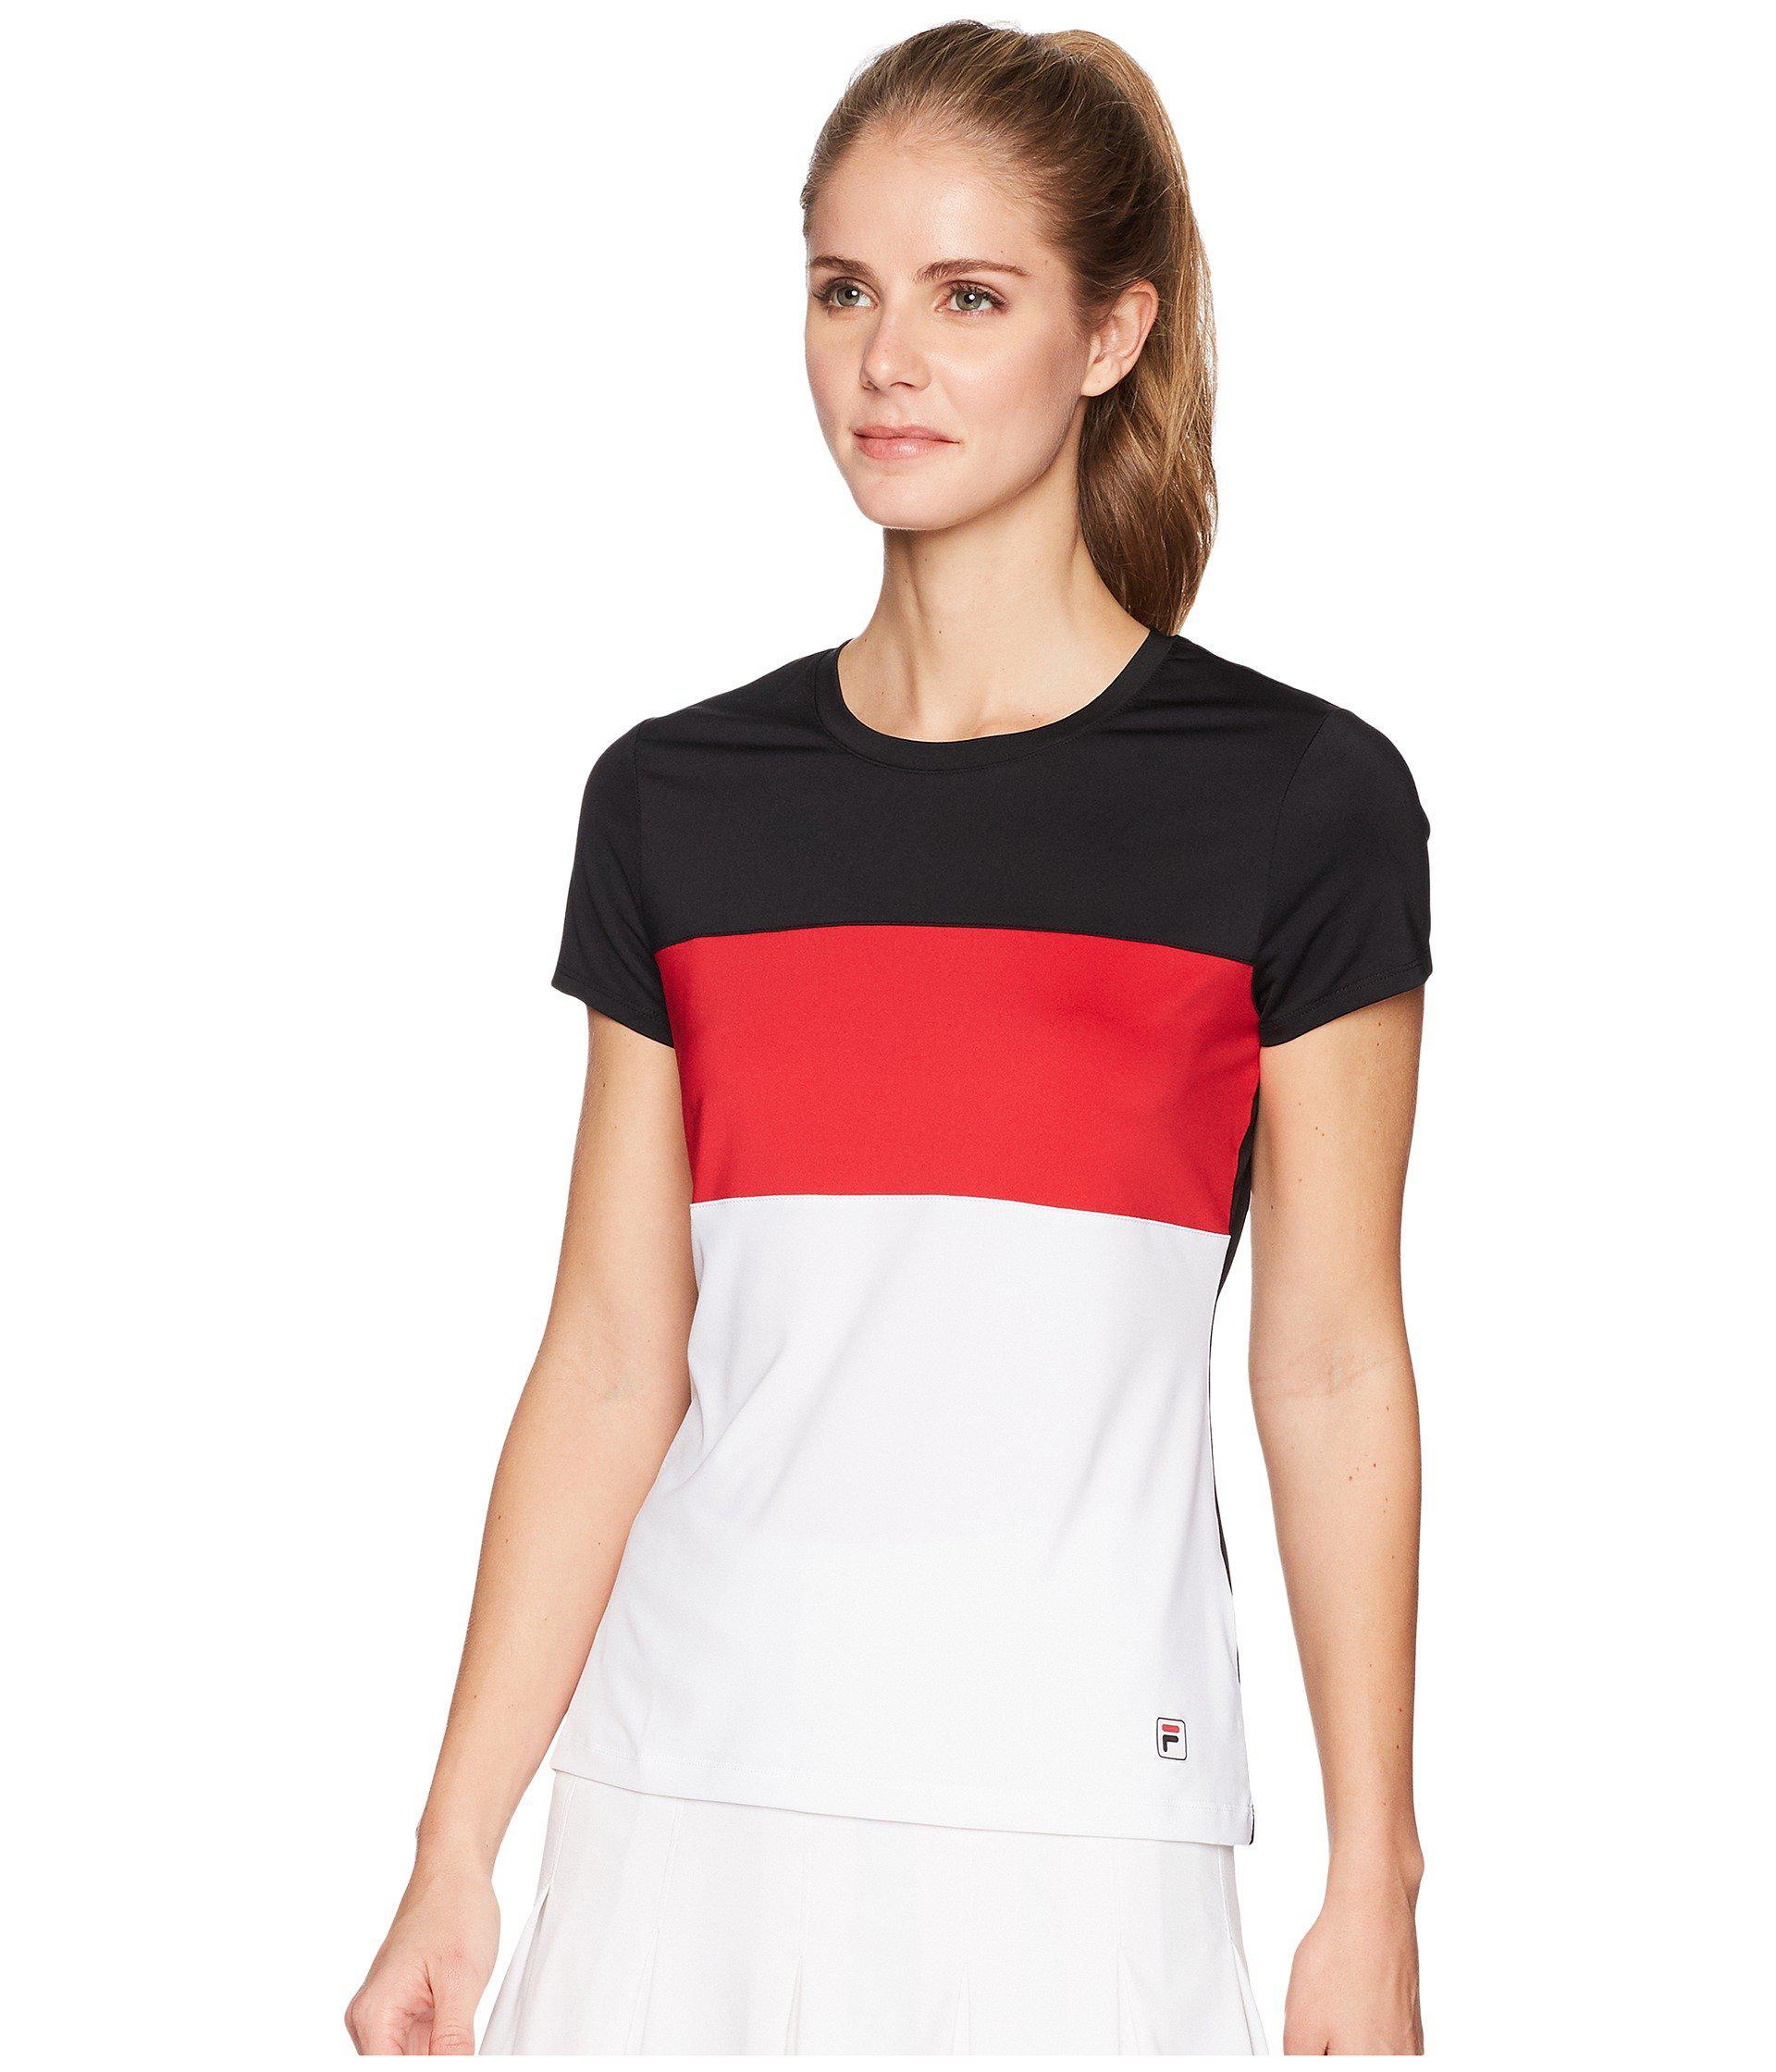 Lyst - Fila Heritage Tennis Cap Sleeve Top in Black - Save 21% 76f3e5032522